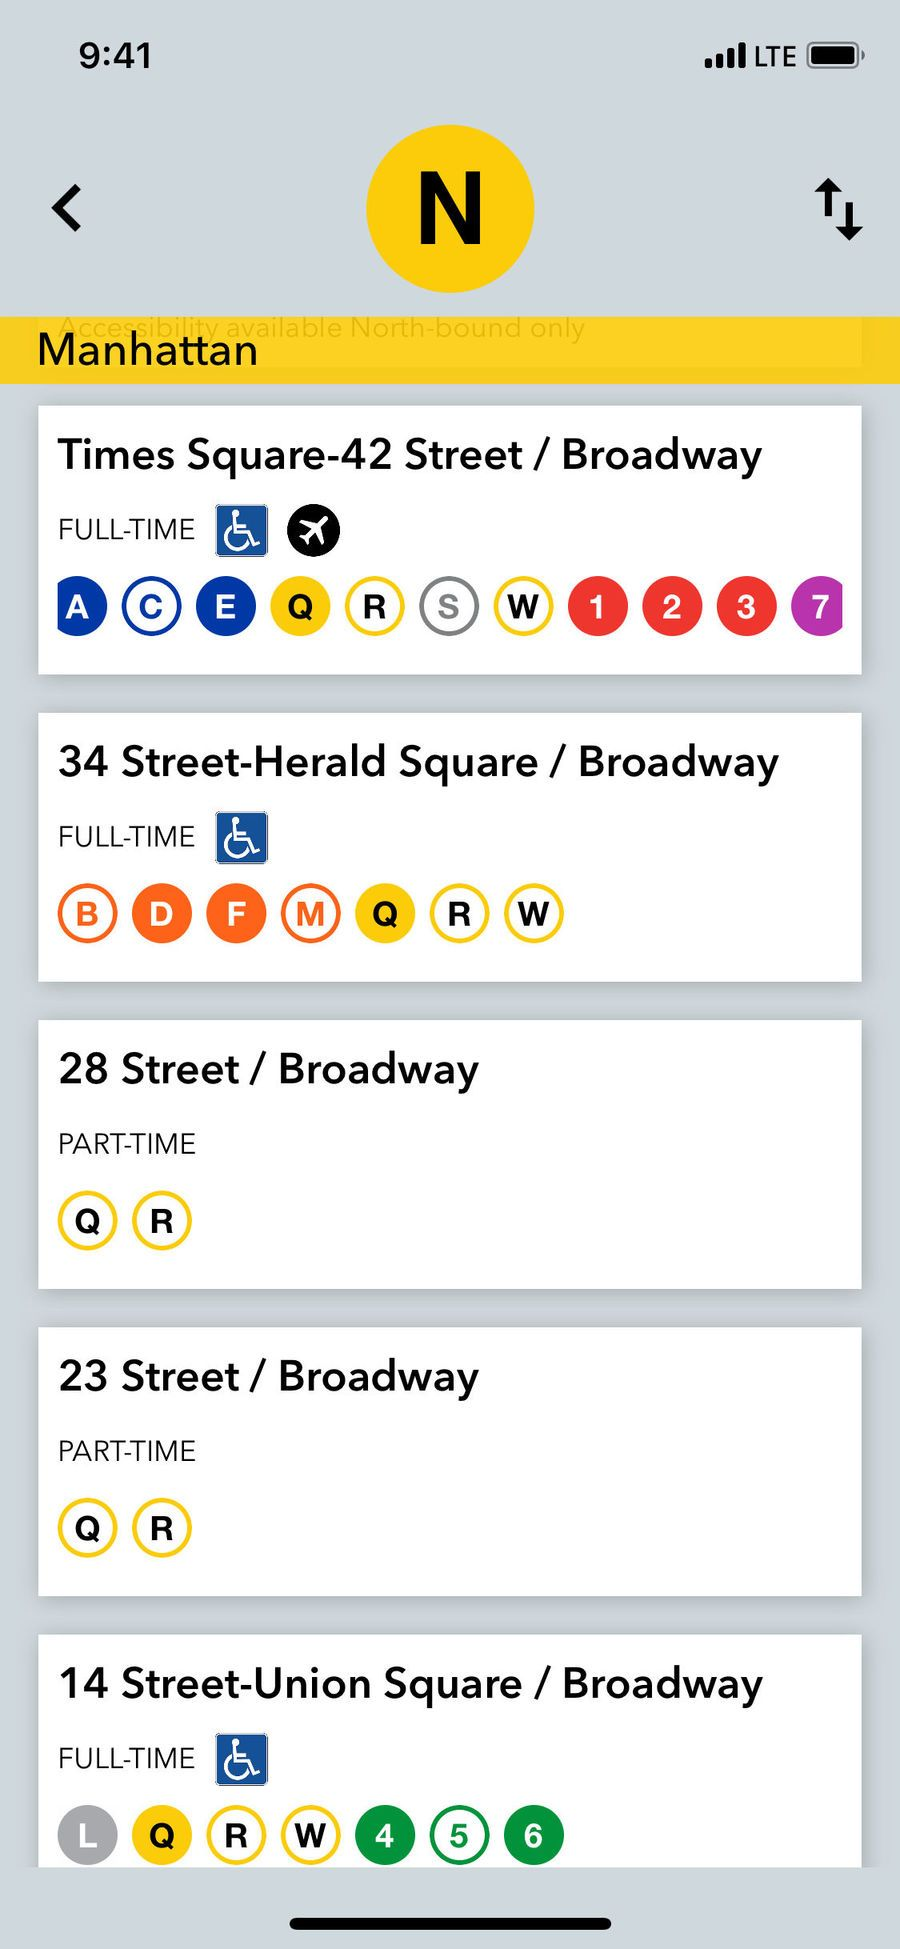 Iphone Map Of New York Offline.New York Subway Map Offline Navigation Dimayuga Ios Travel Apple